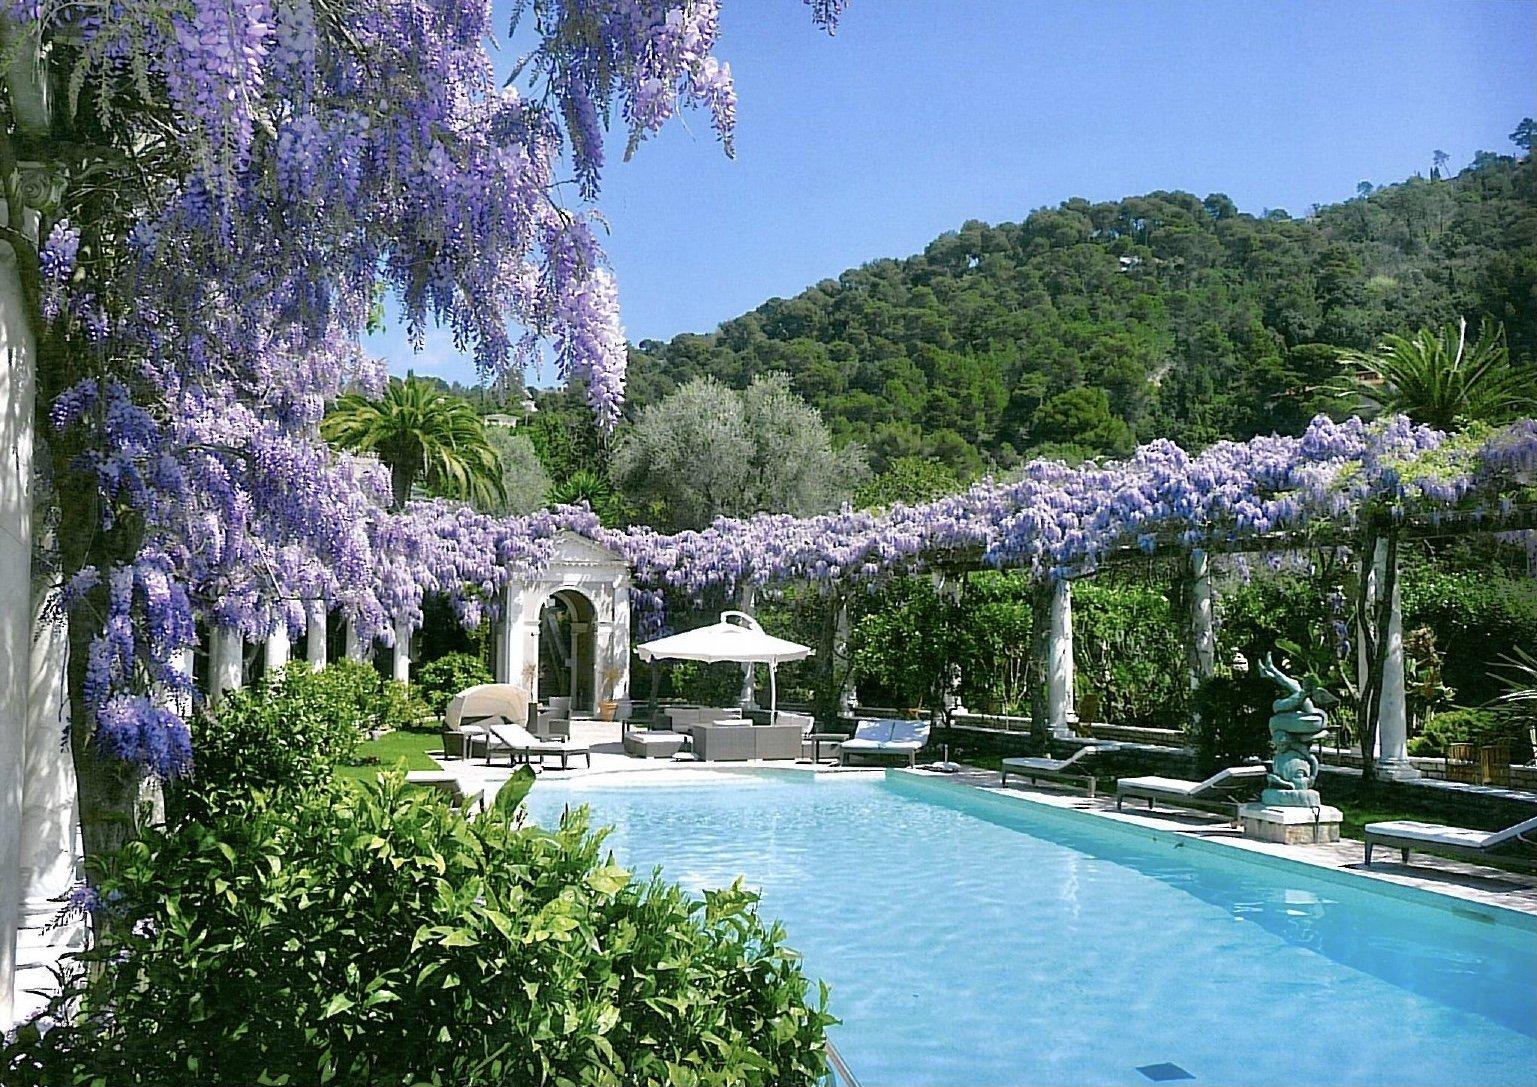 For sale - Sumptuous villa and its incredible botanical garden - Cannes La Californie